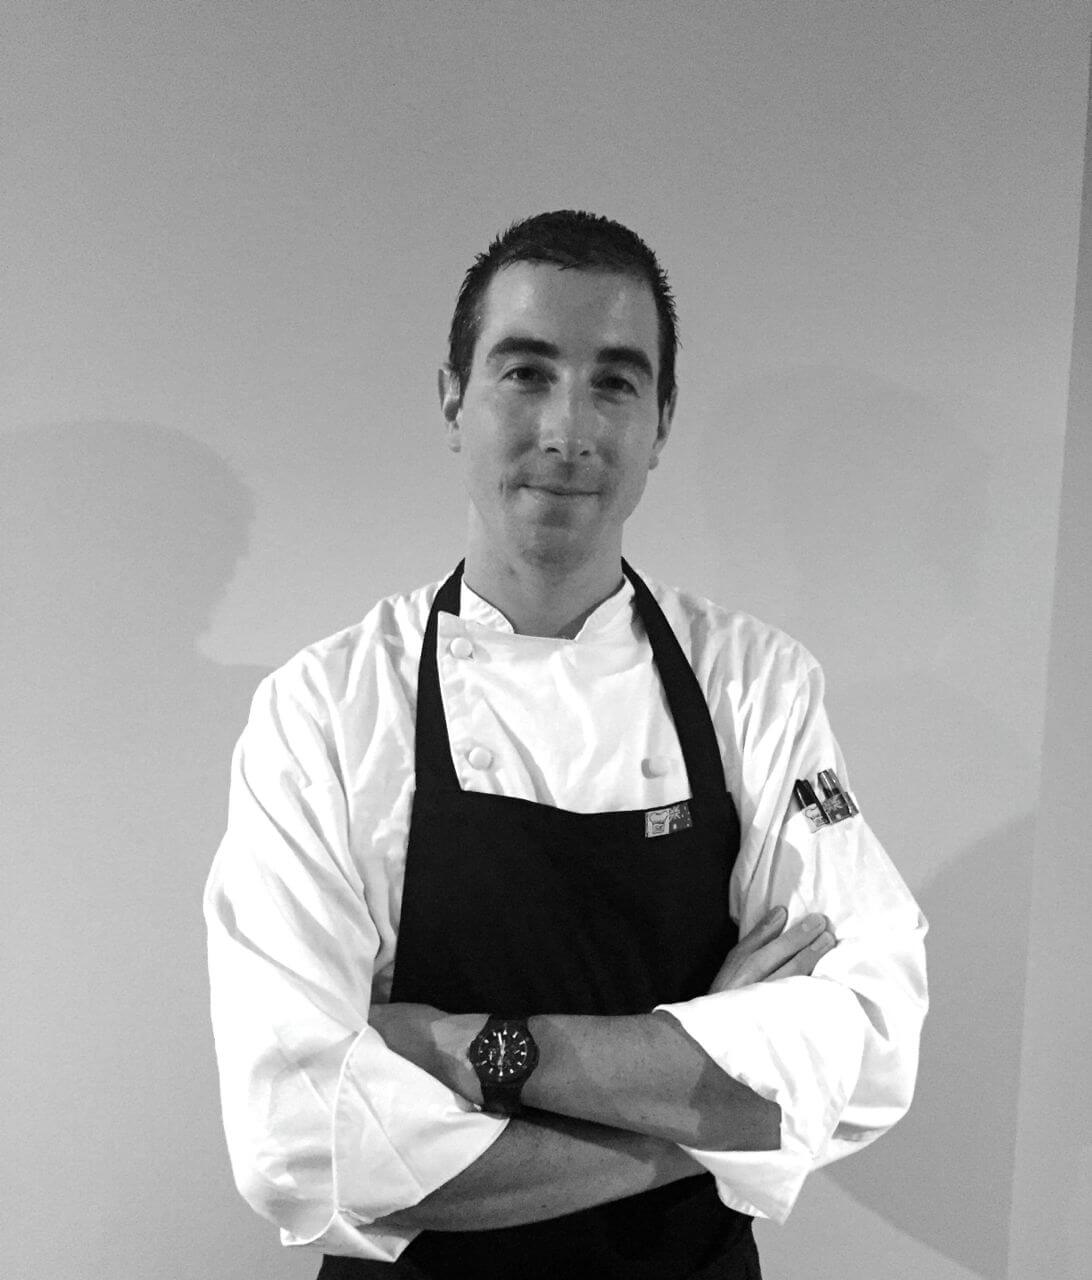 Personal Chef Sydney Sean Kommer